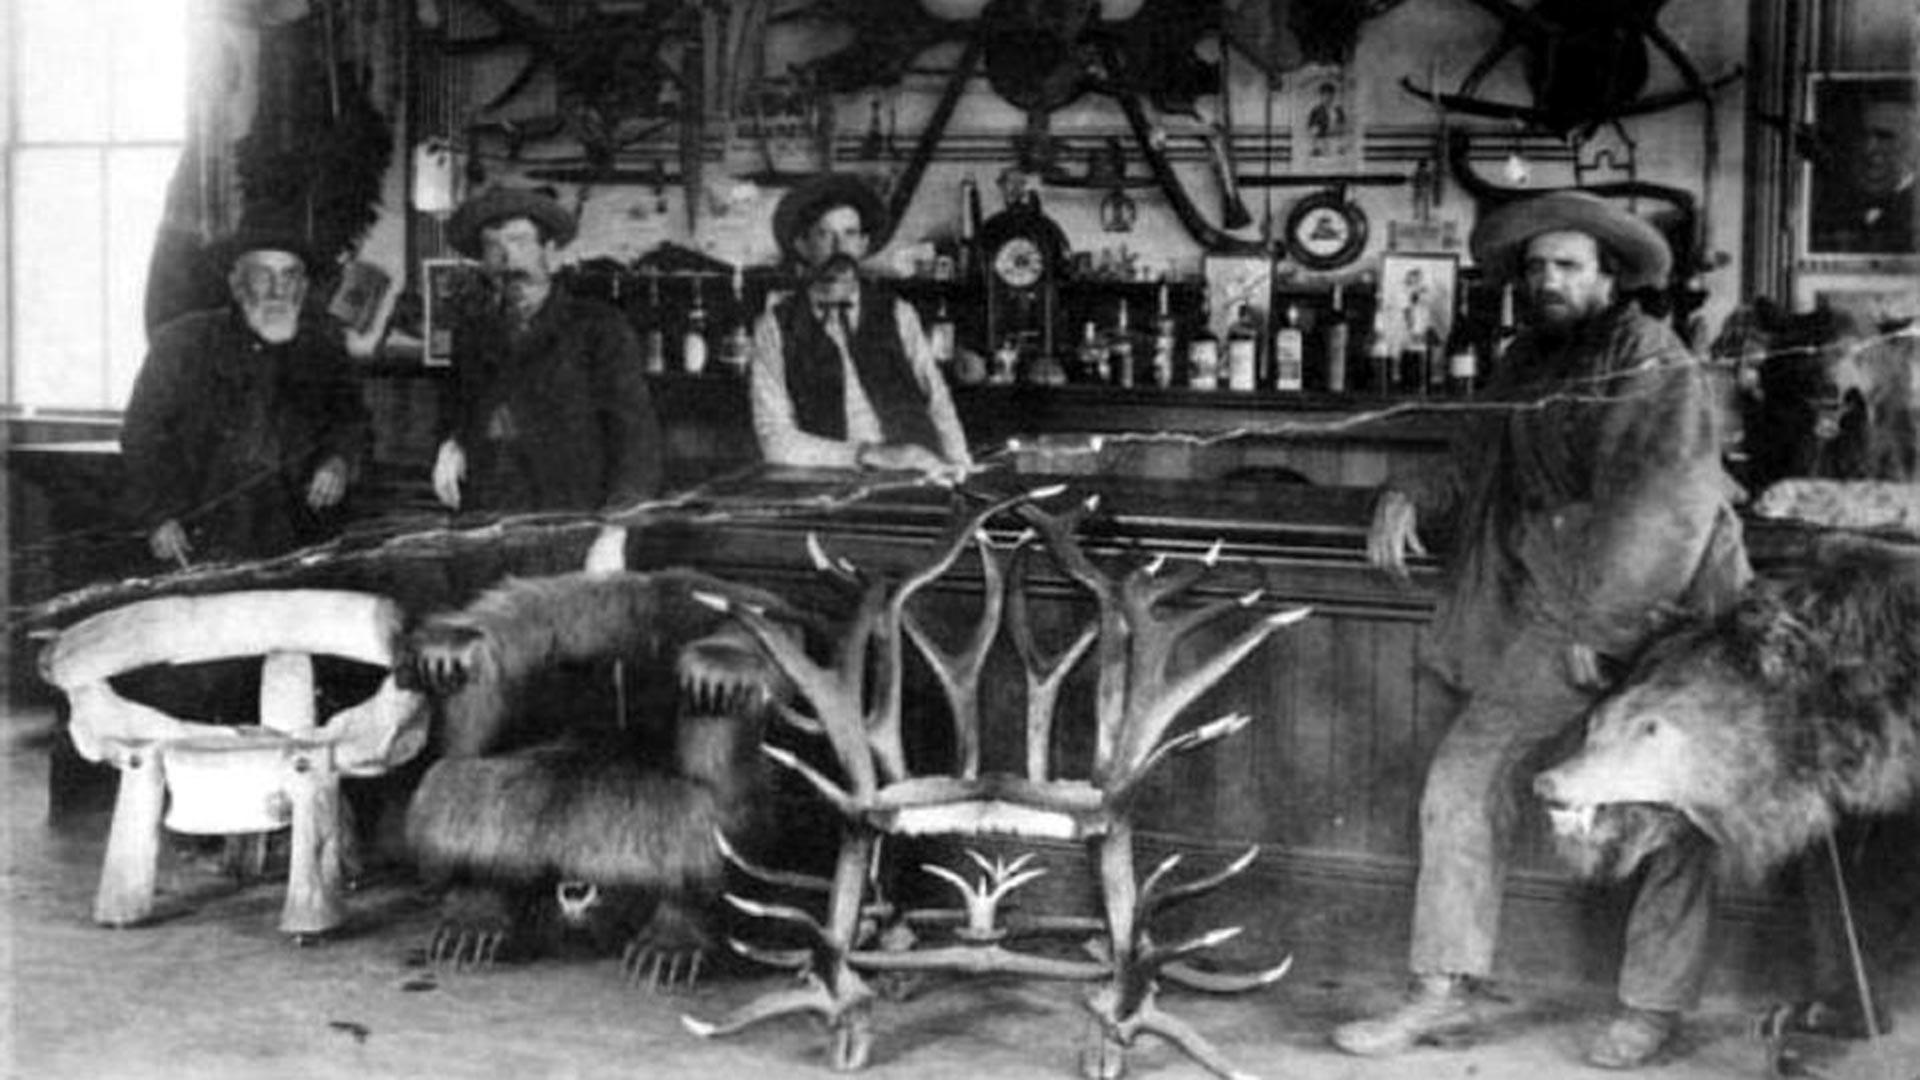 Table Bluff, California, 1889